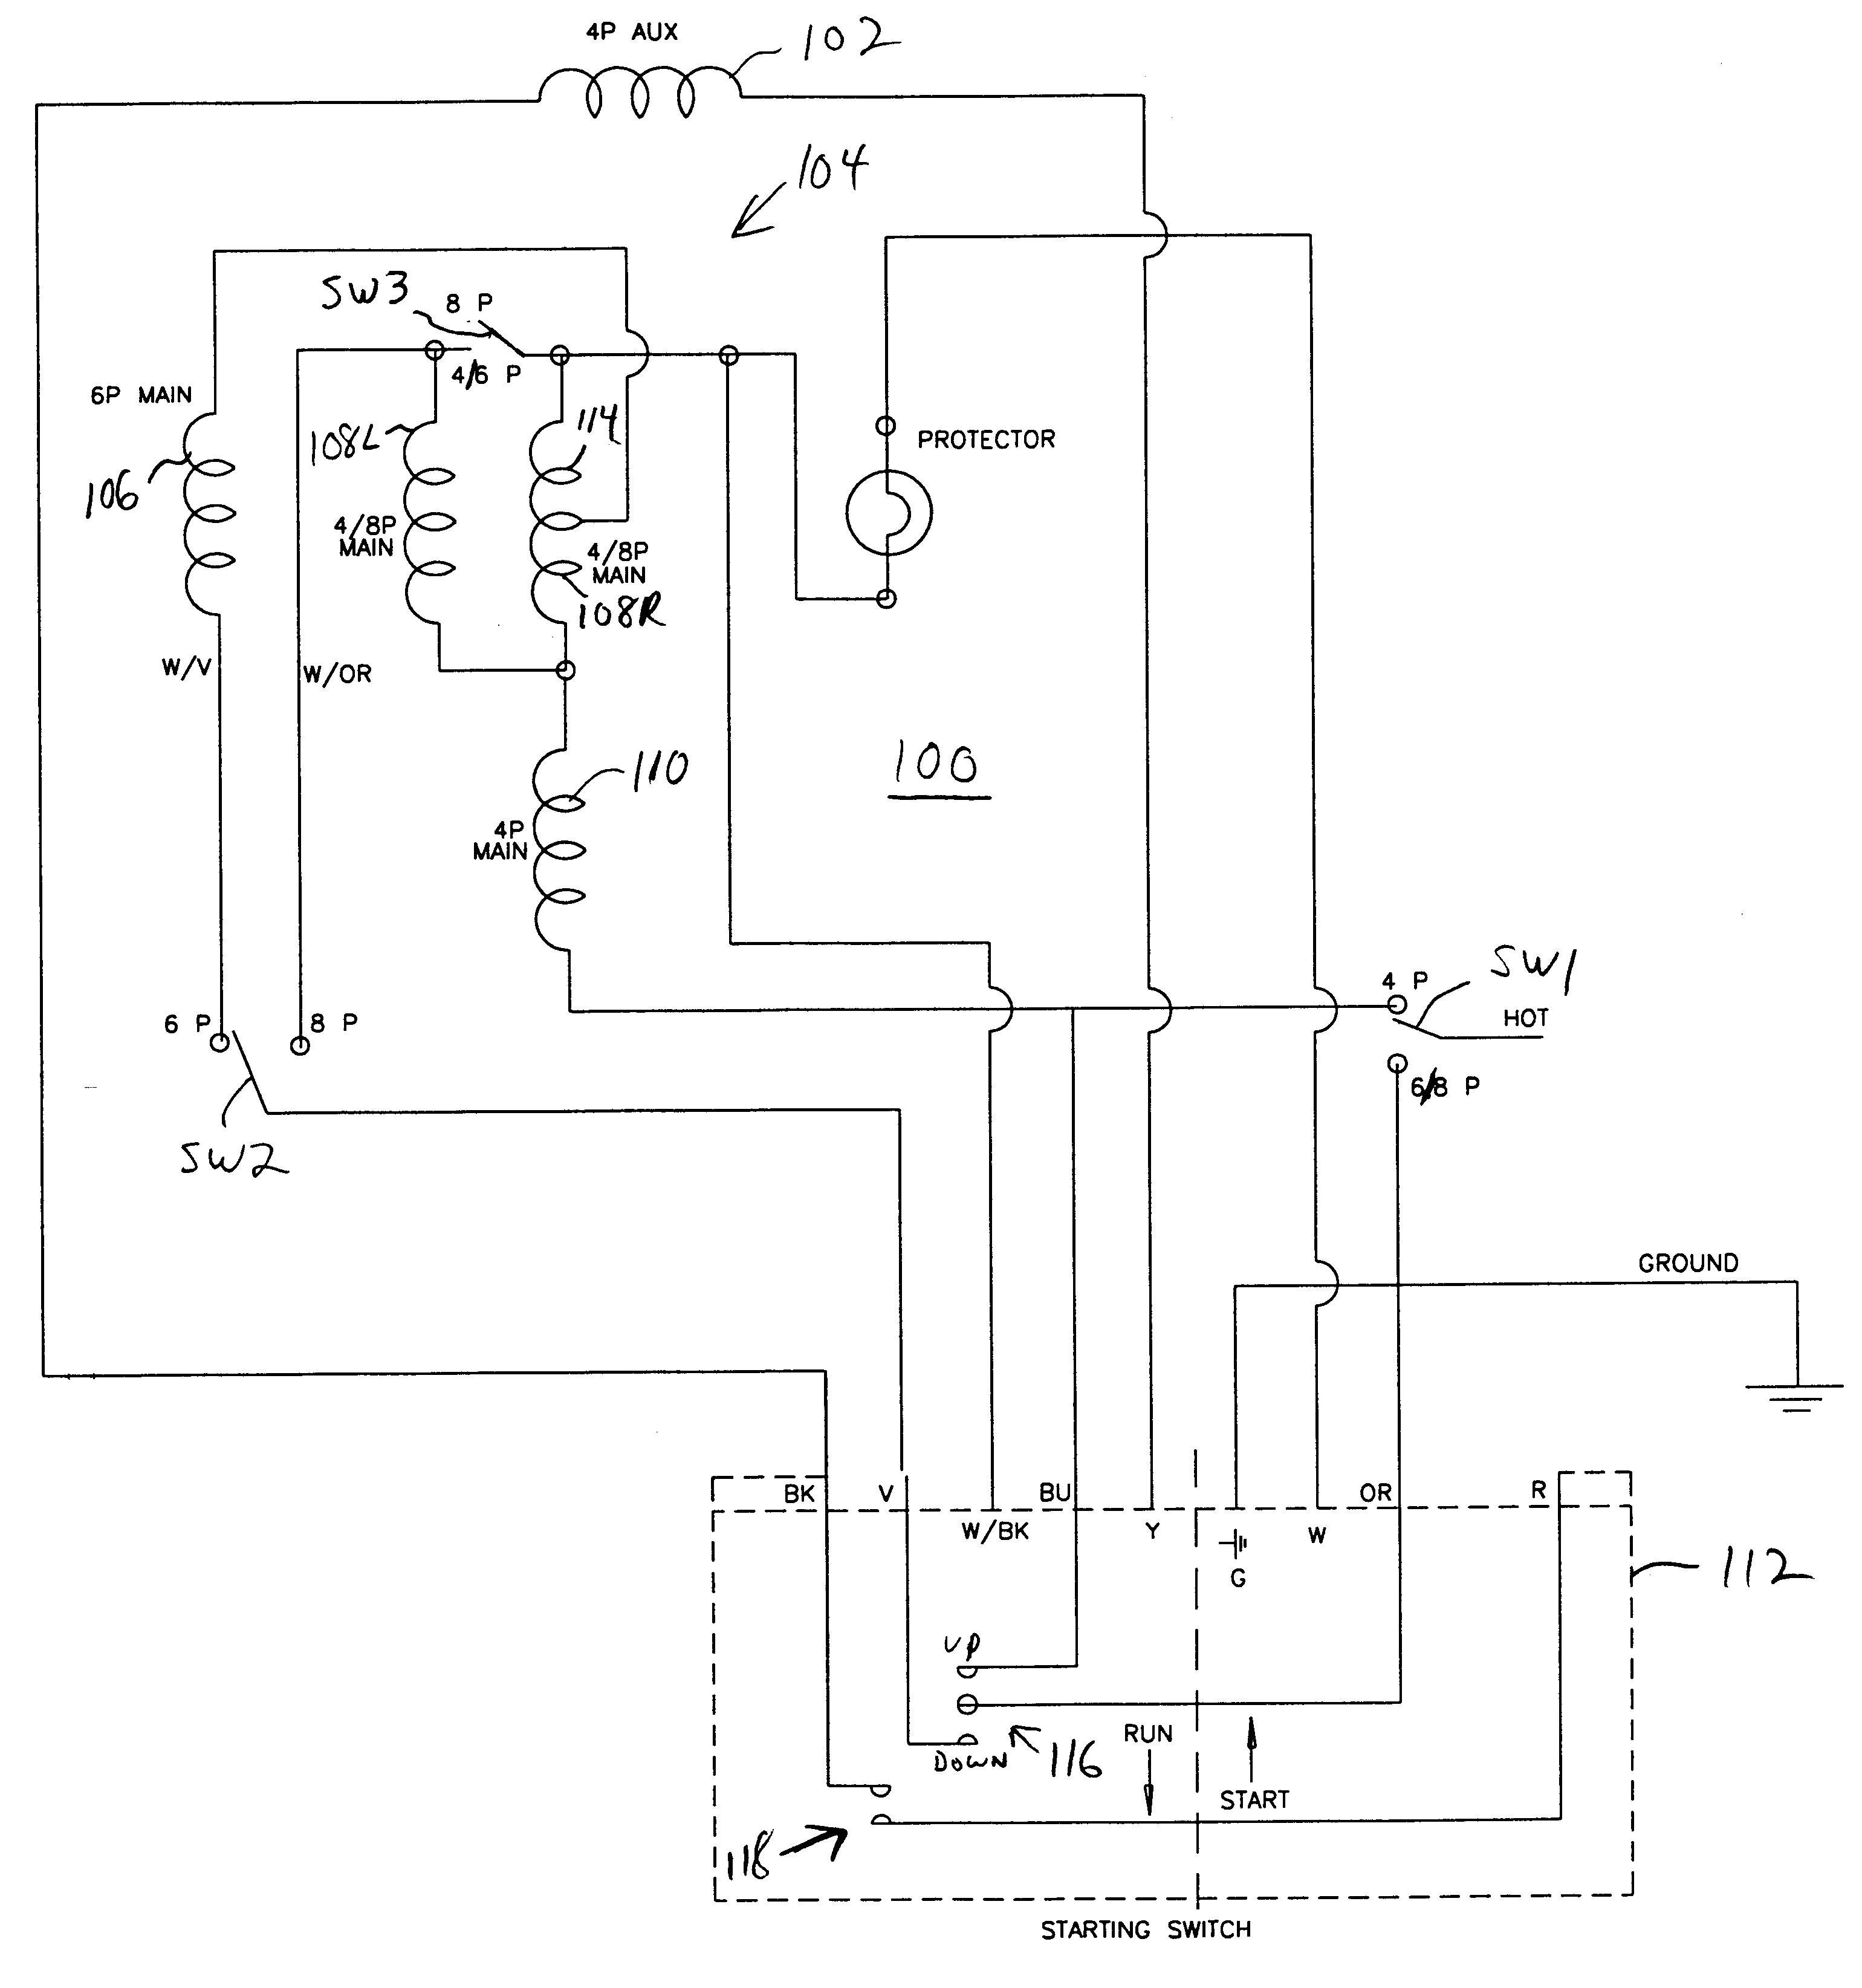 Exelent Single Phase 230v Motor Wiring Diagram Ideas - Best Images ...